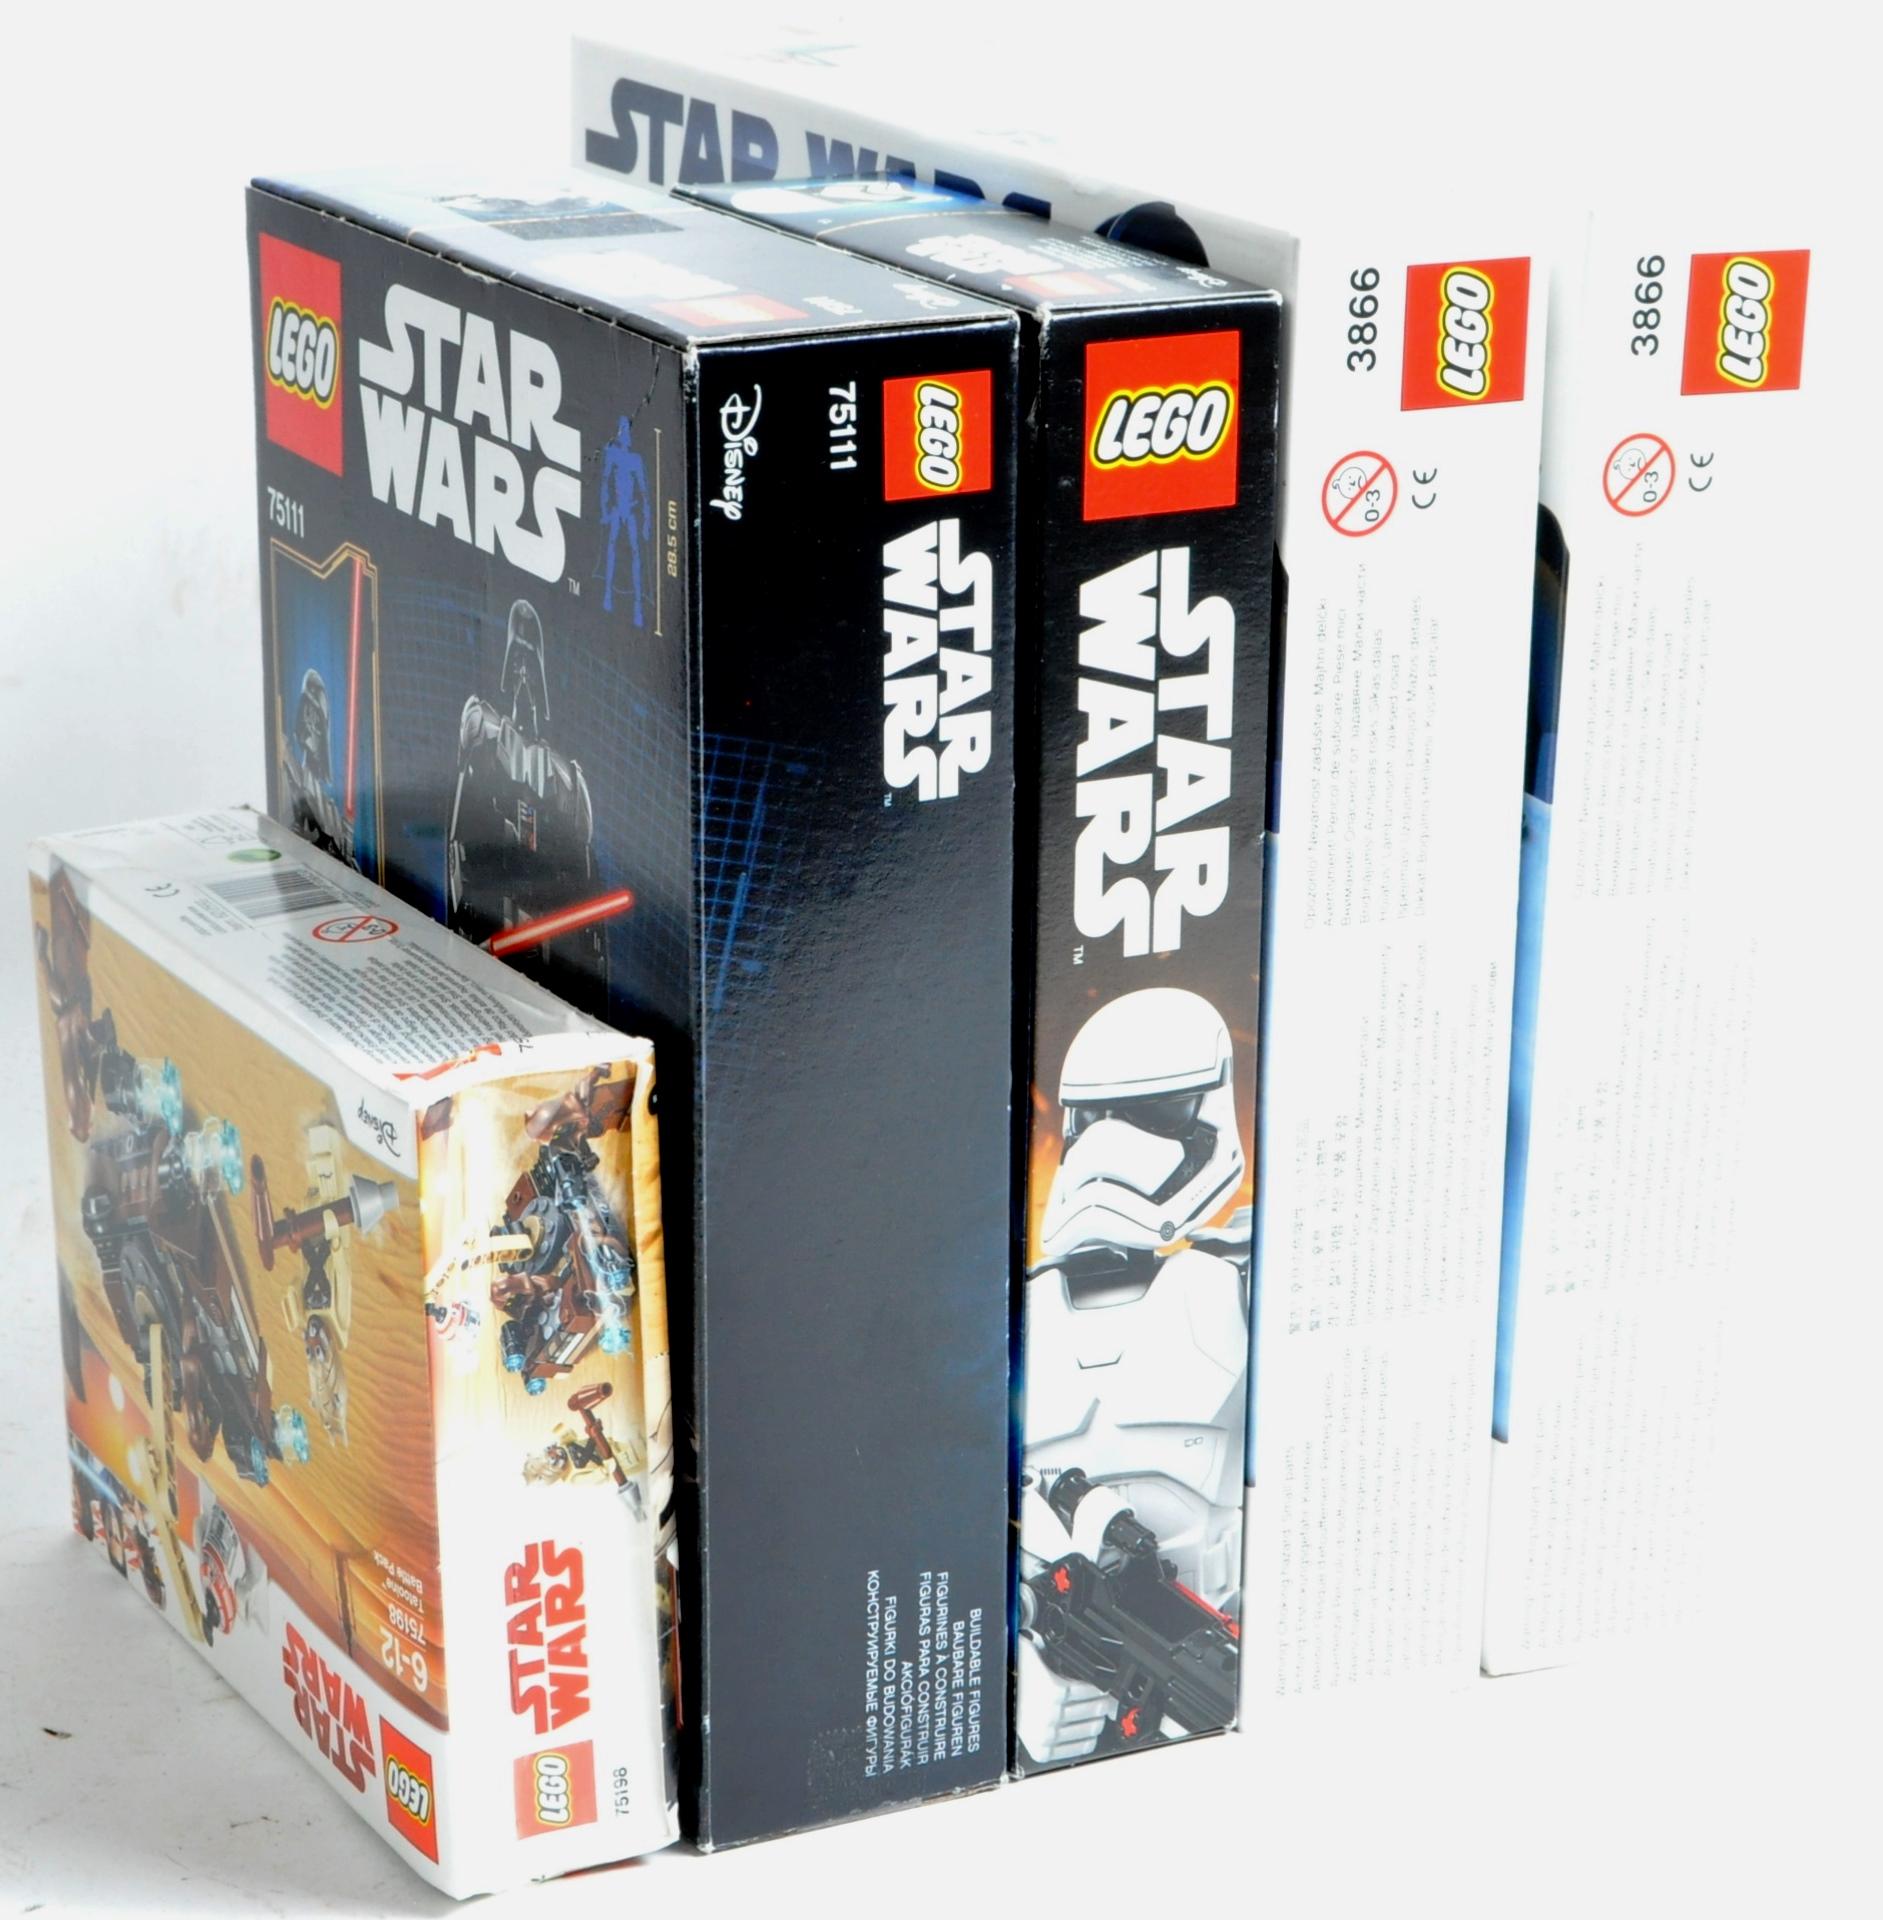 LEGO SETS - LEGO STAR WARS - 3866 / 75111 / 75114 / 75198 - Image 7 of 8